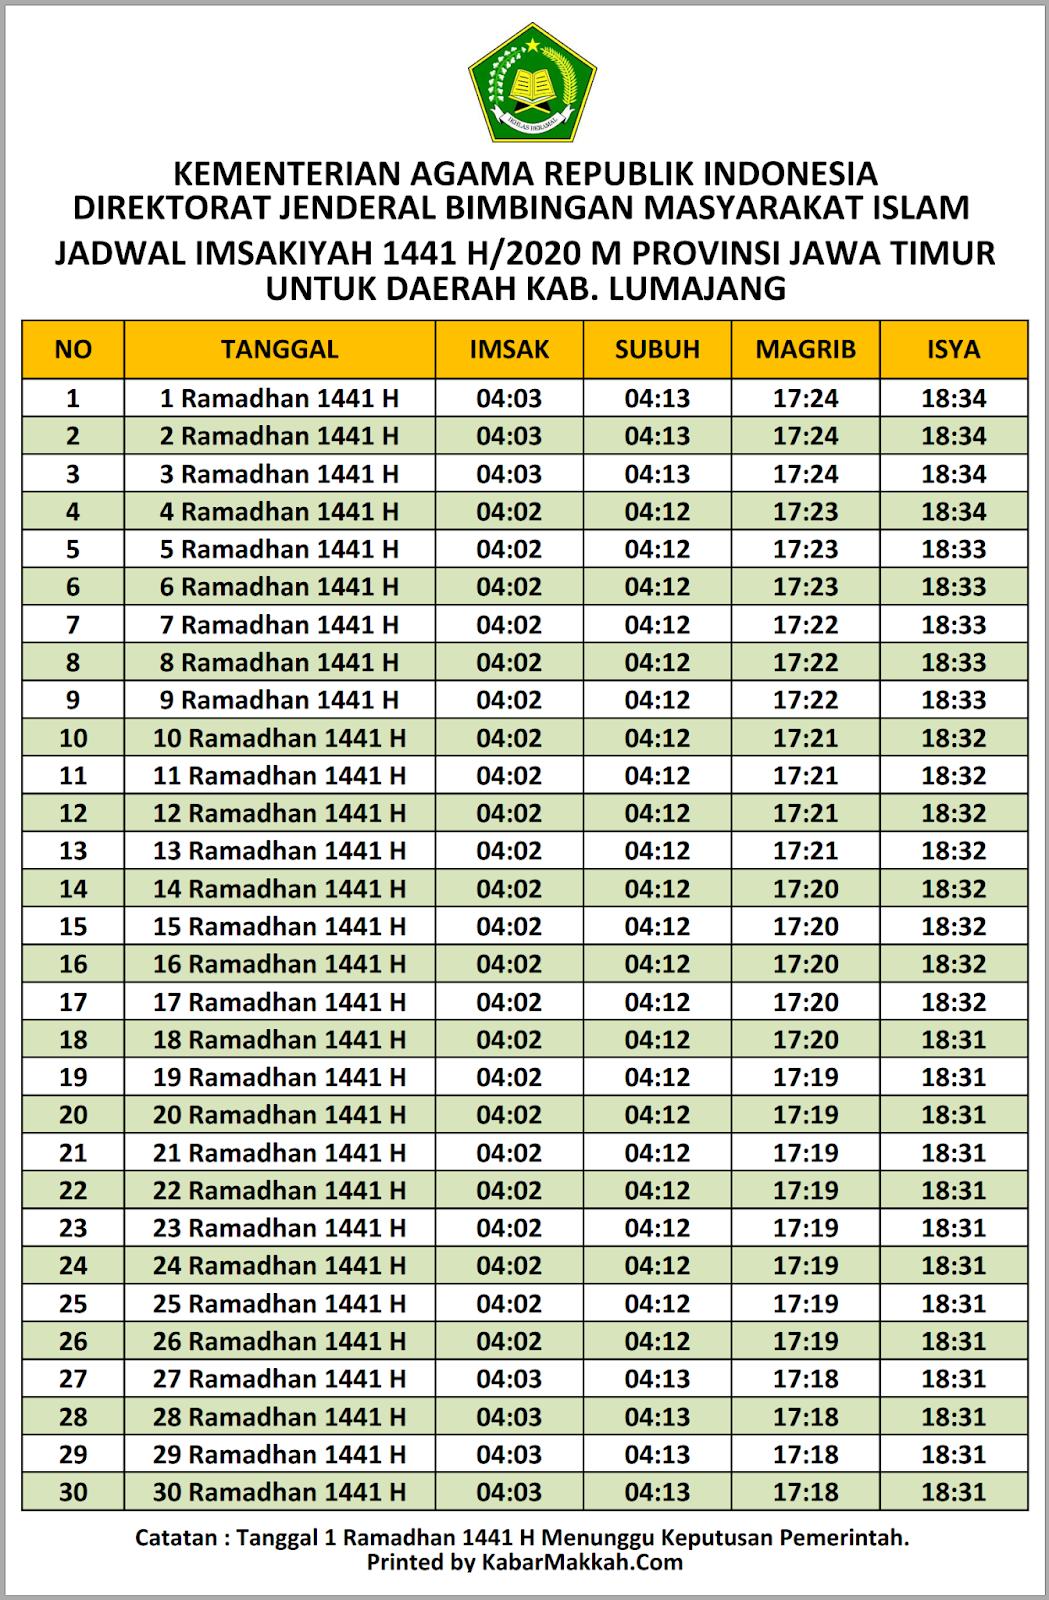 Jadwal Imsakiyah Lumajang 2020